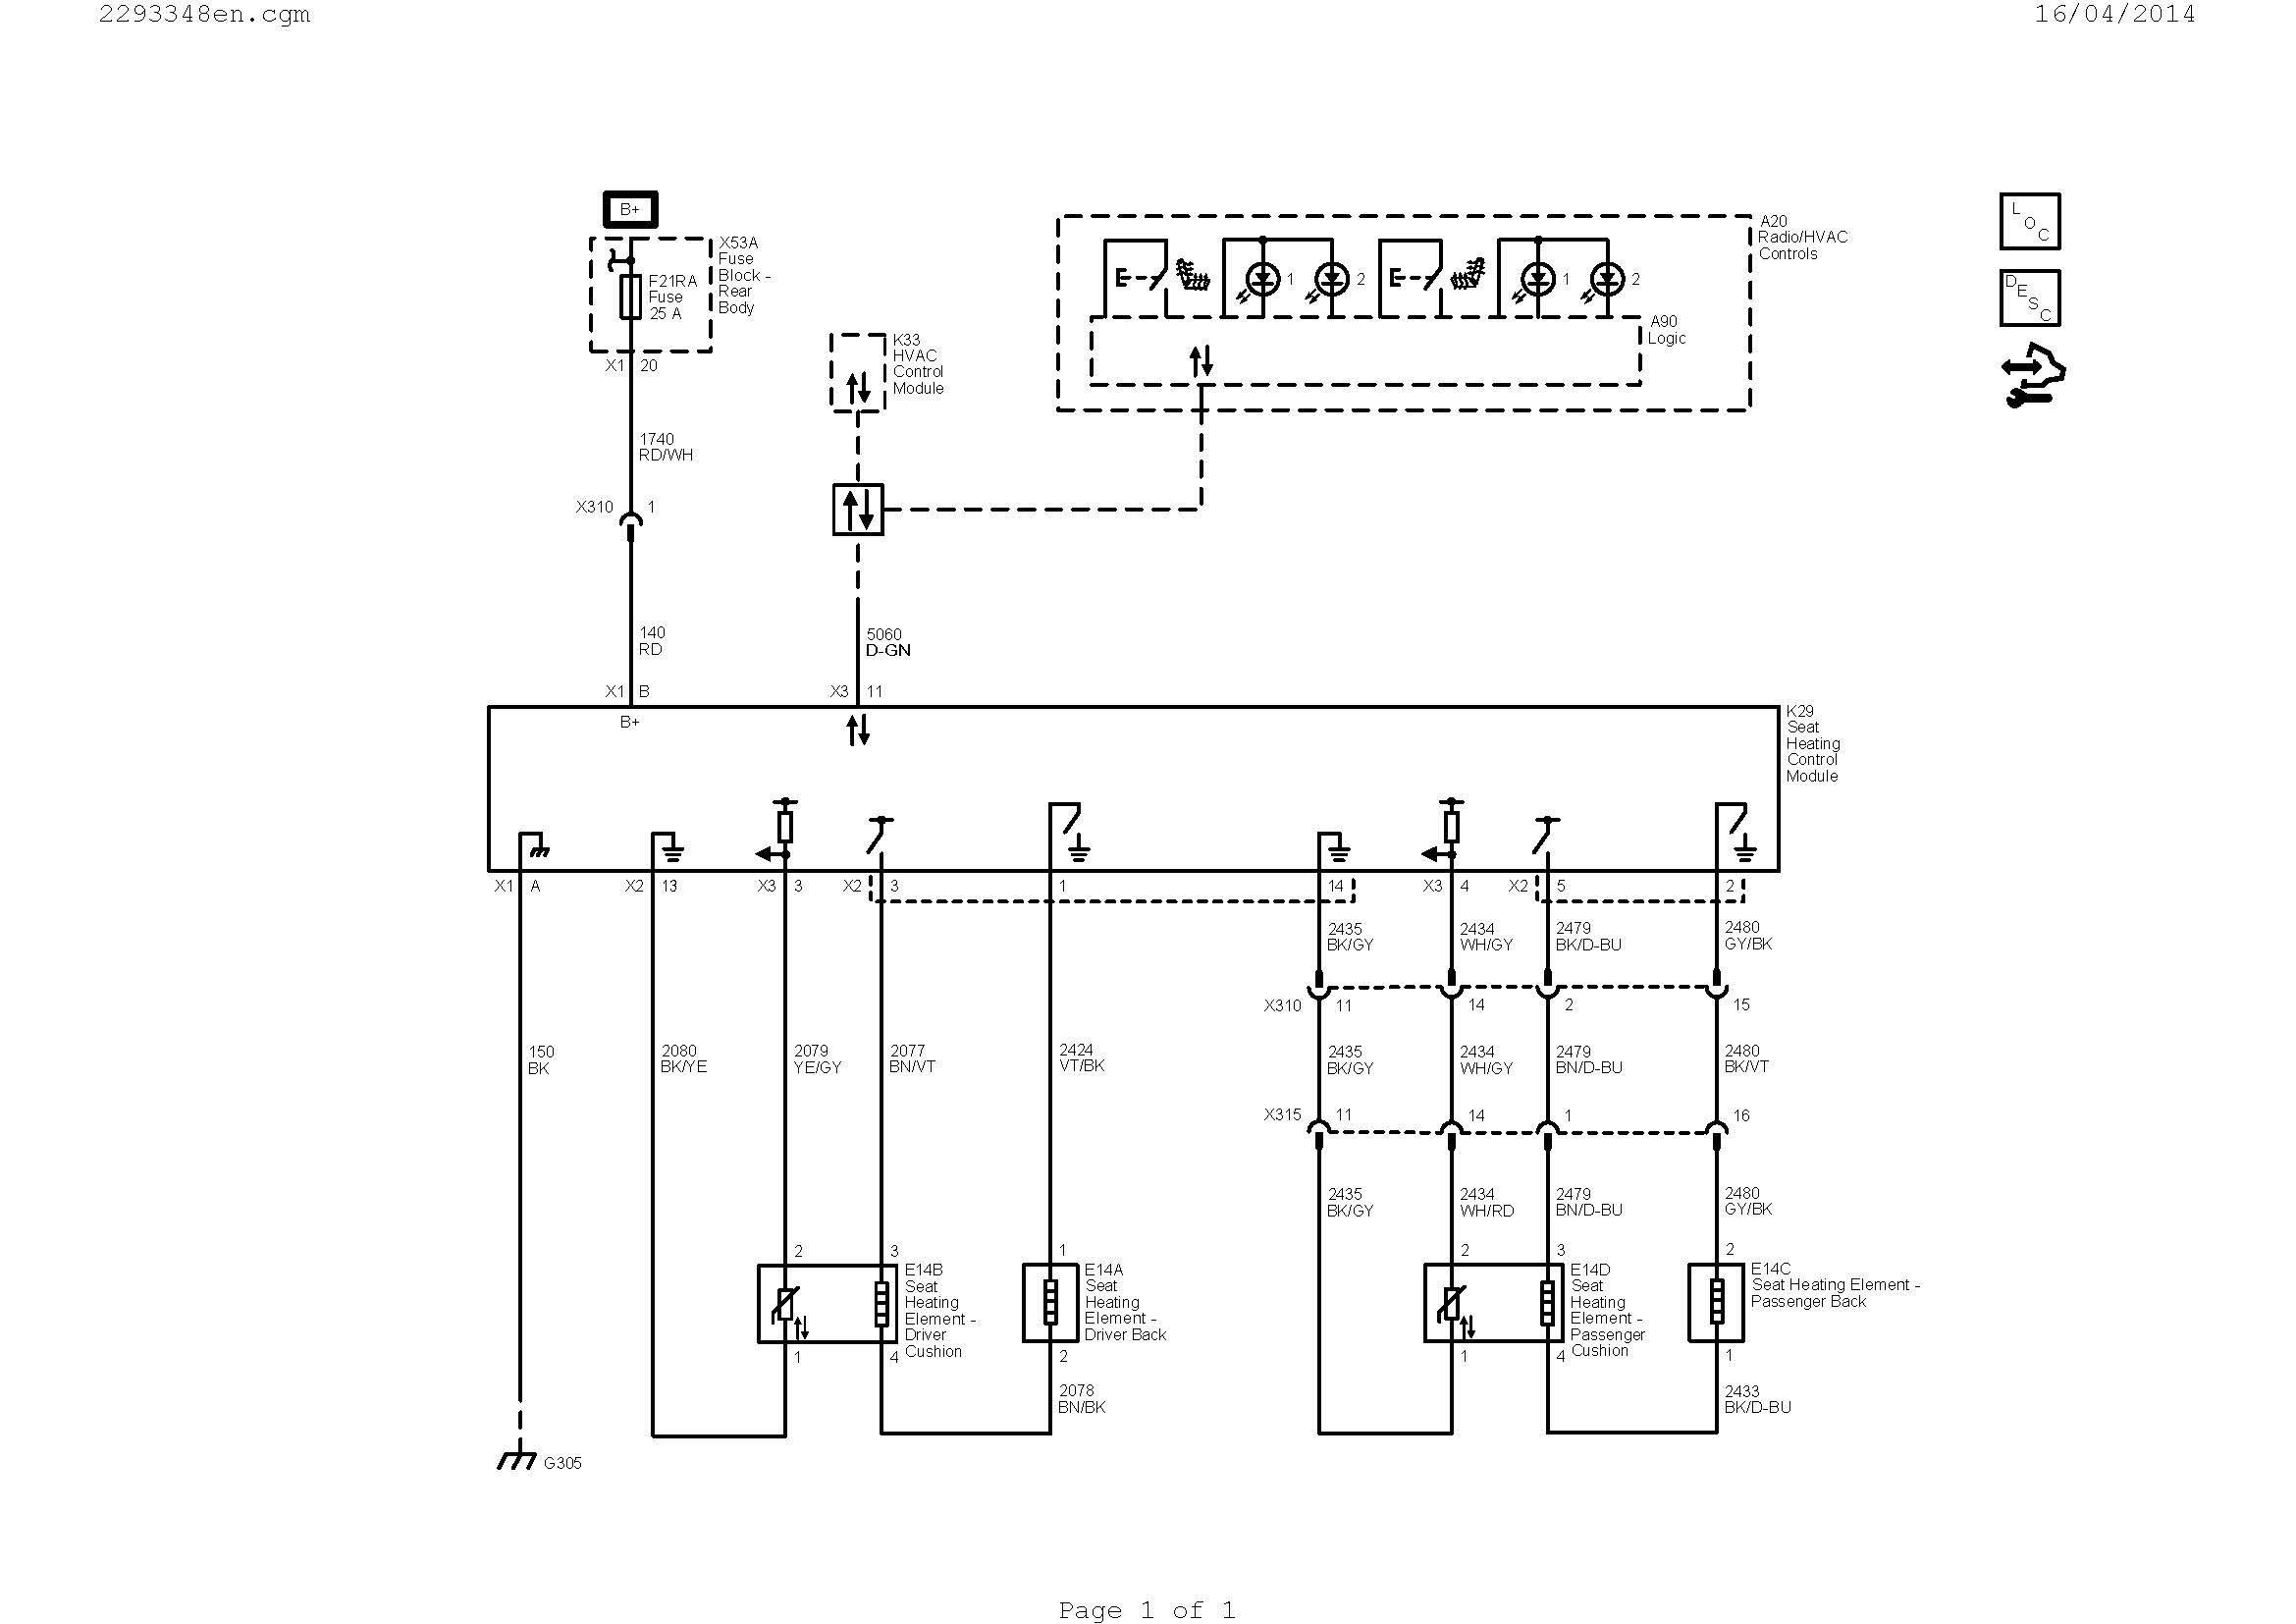 outback radian wiring diagram Download-automotive ac diagram Download Wiring Diagrams For Central Heating Refrence Hvac Diagram Best Hvac Diagram 18-l